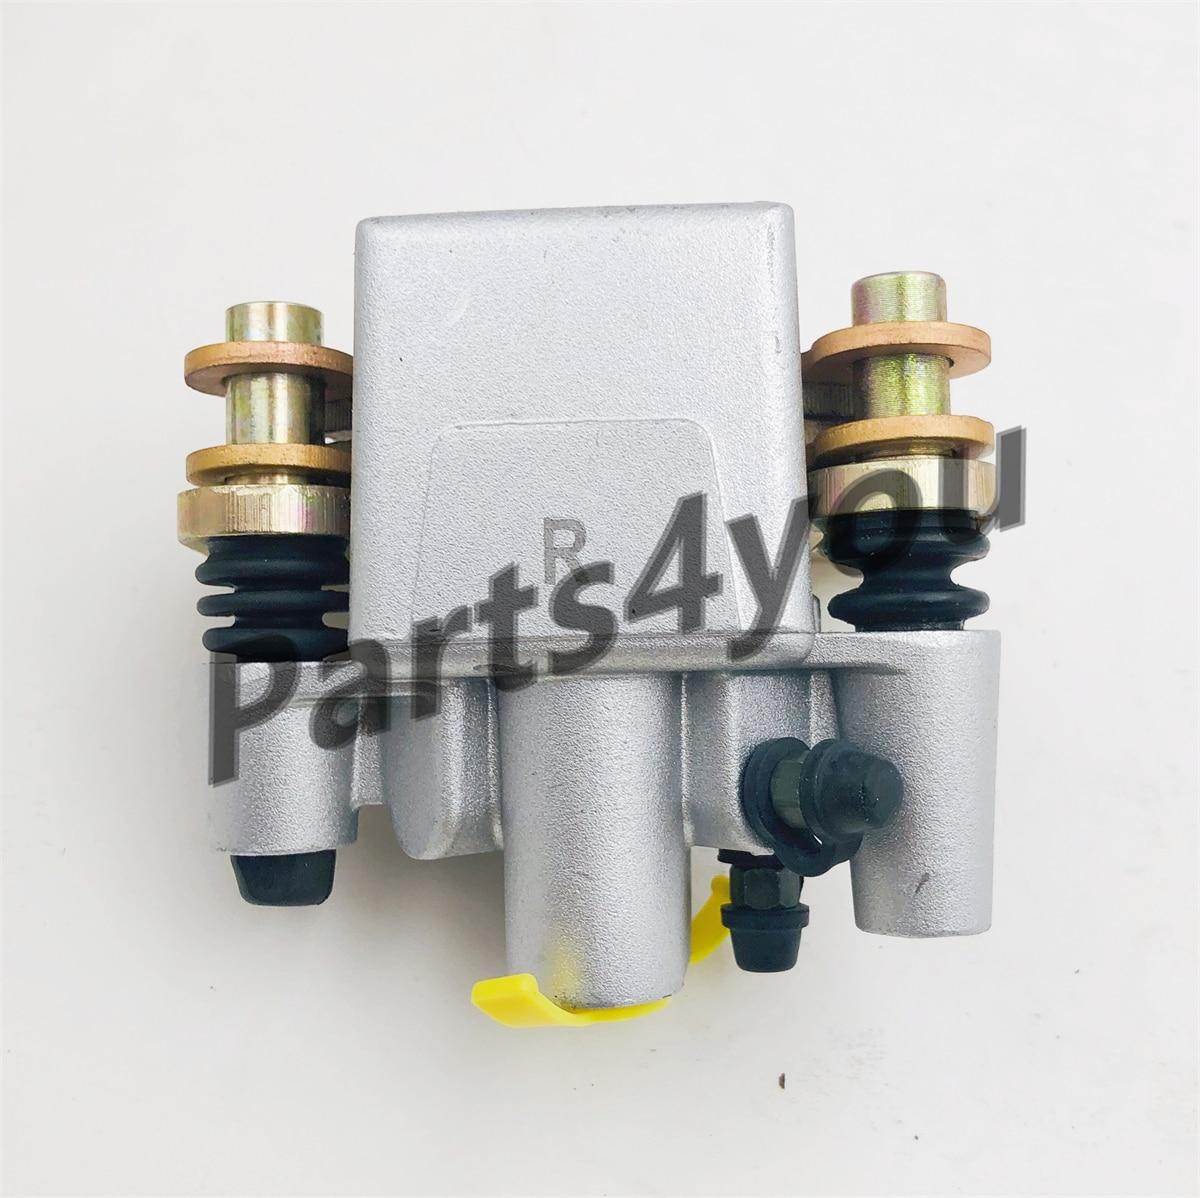 Front Brake Left and Right Caliper For  CFmoto 400 450 520 550 CF400 CF520 CForce  400 450 520 ATV 7020-080700 7020-080800 enlarge